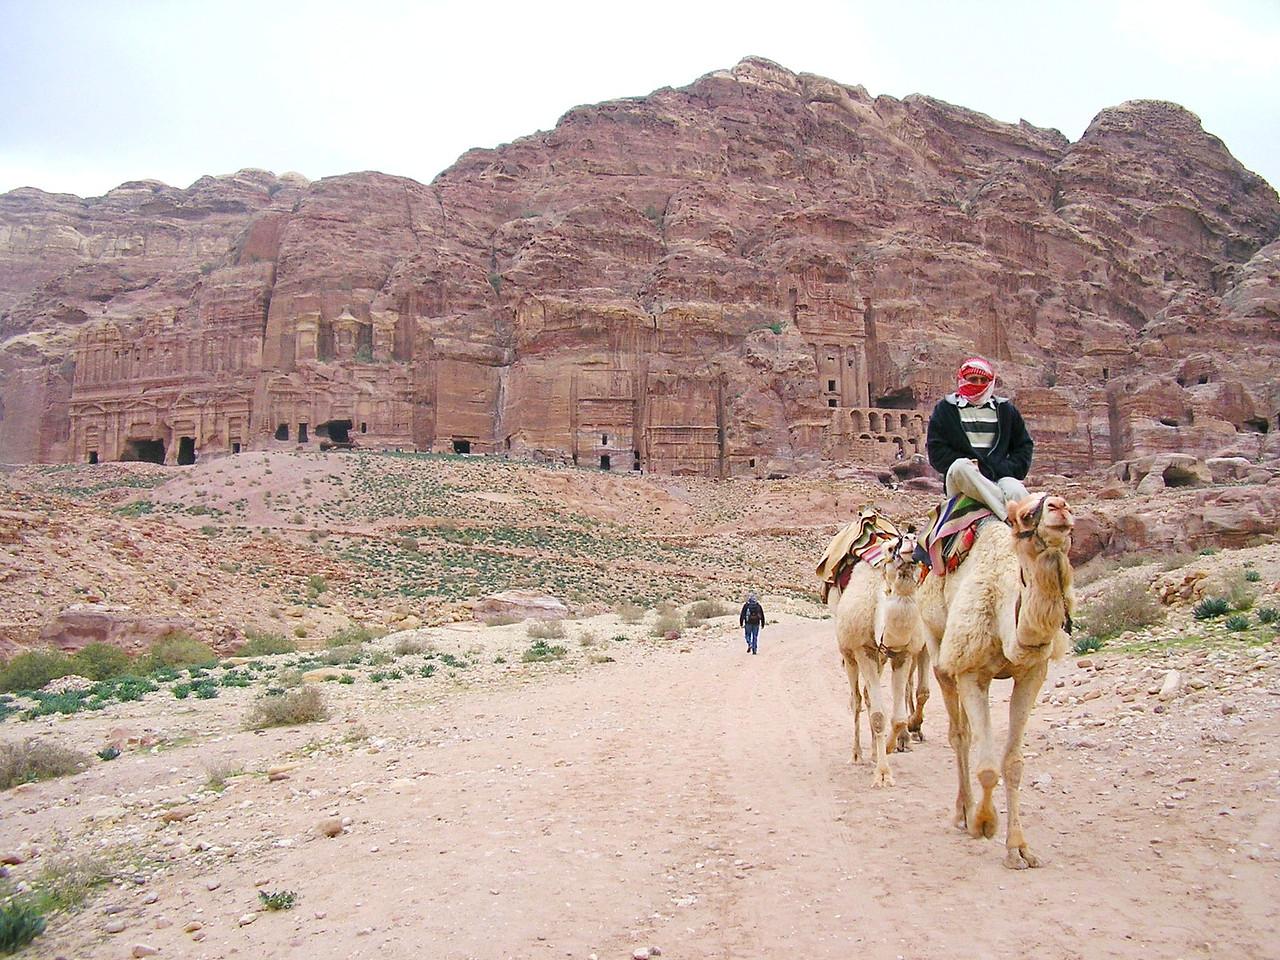 Camel Rider at the Palace Tomb